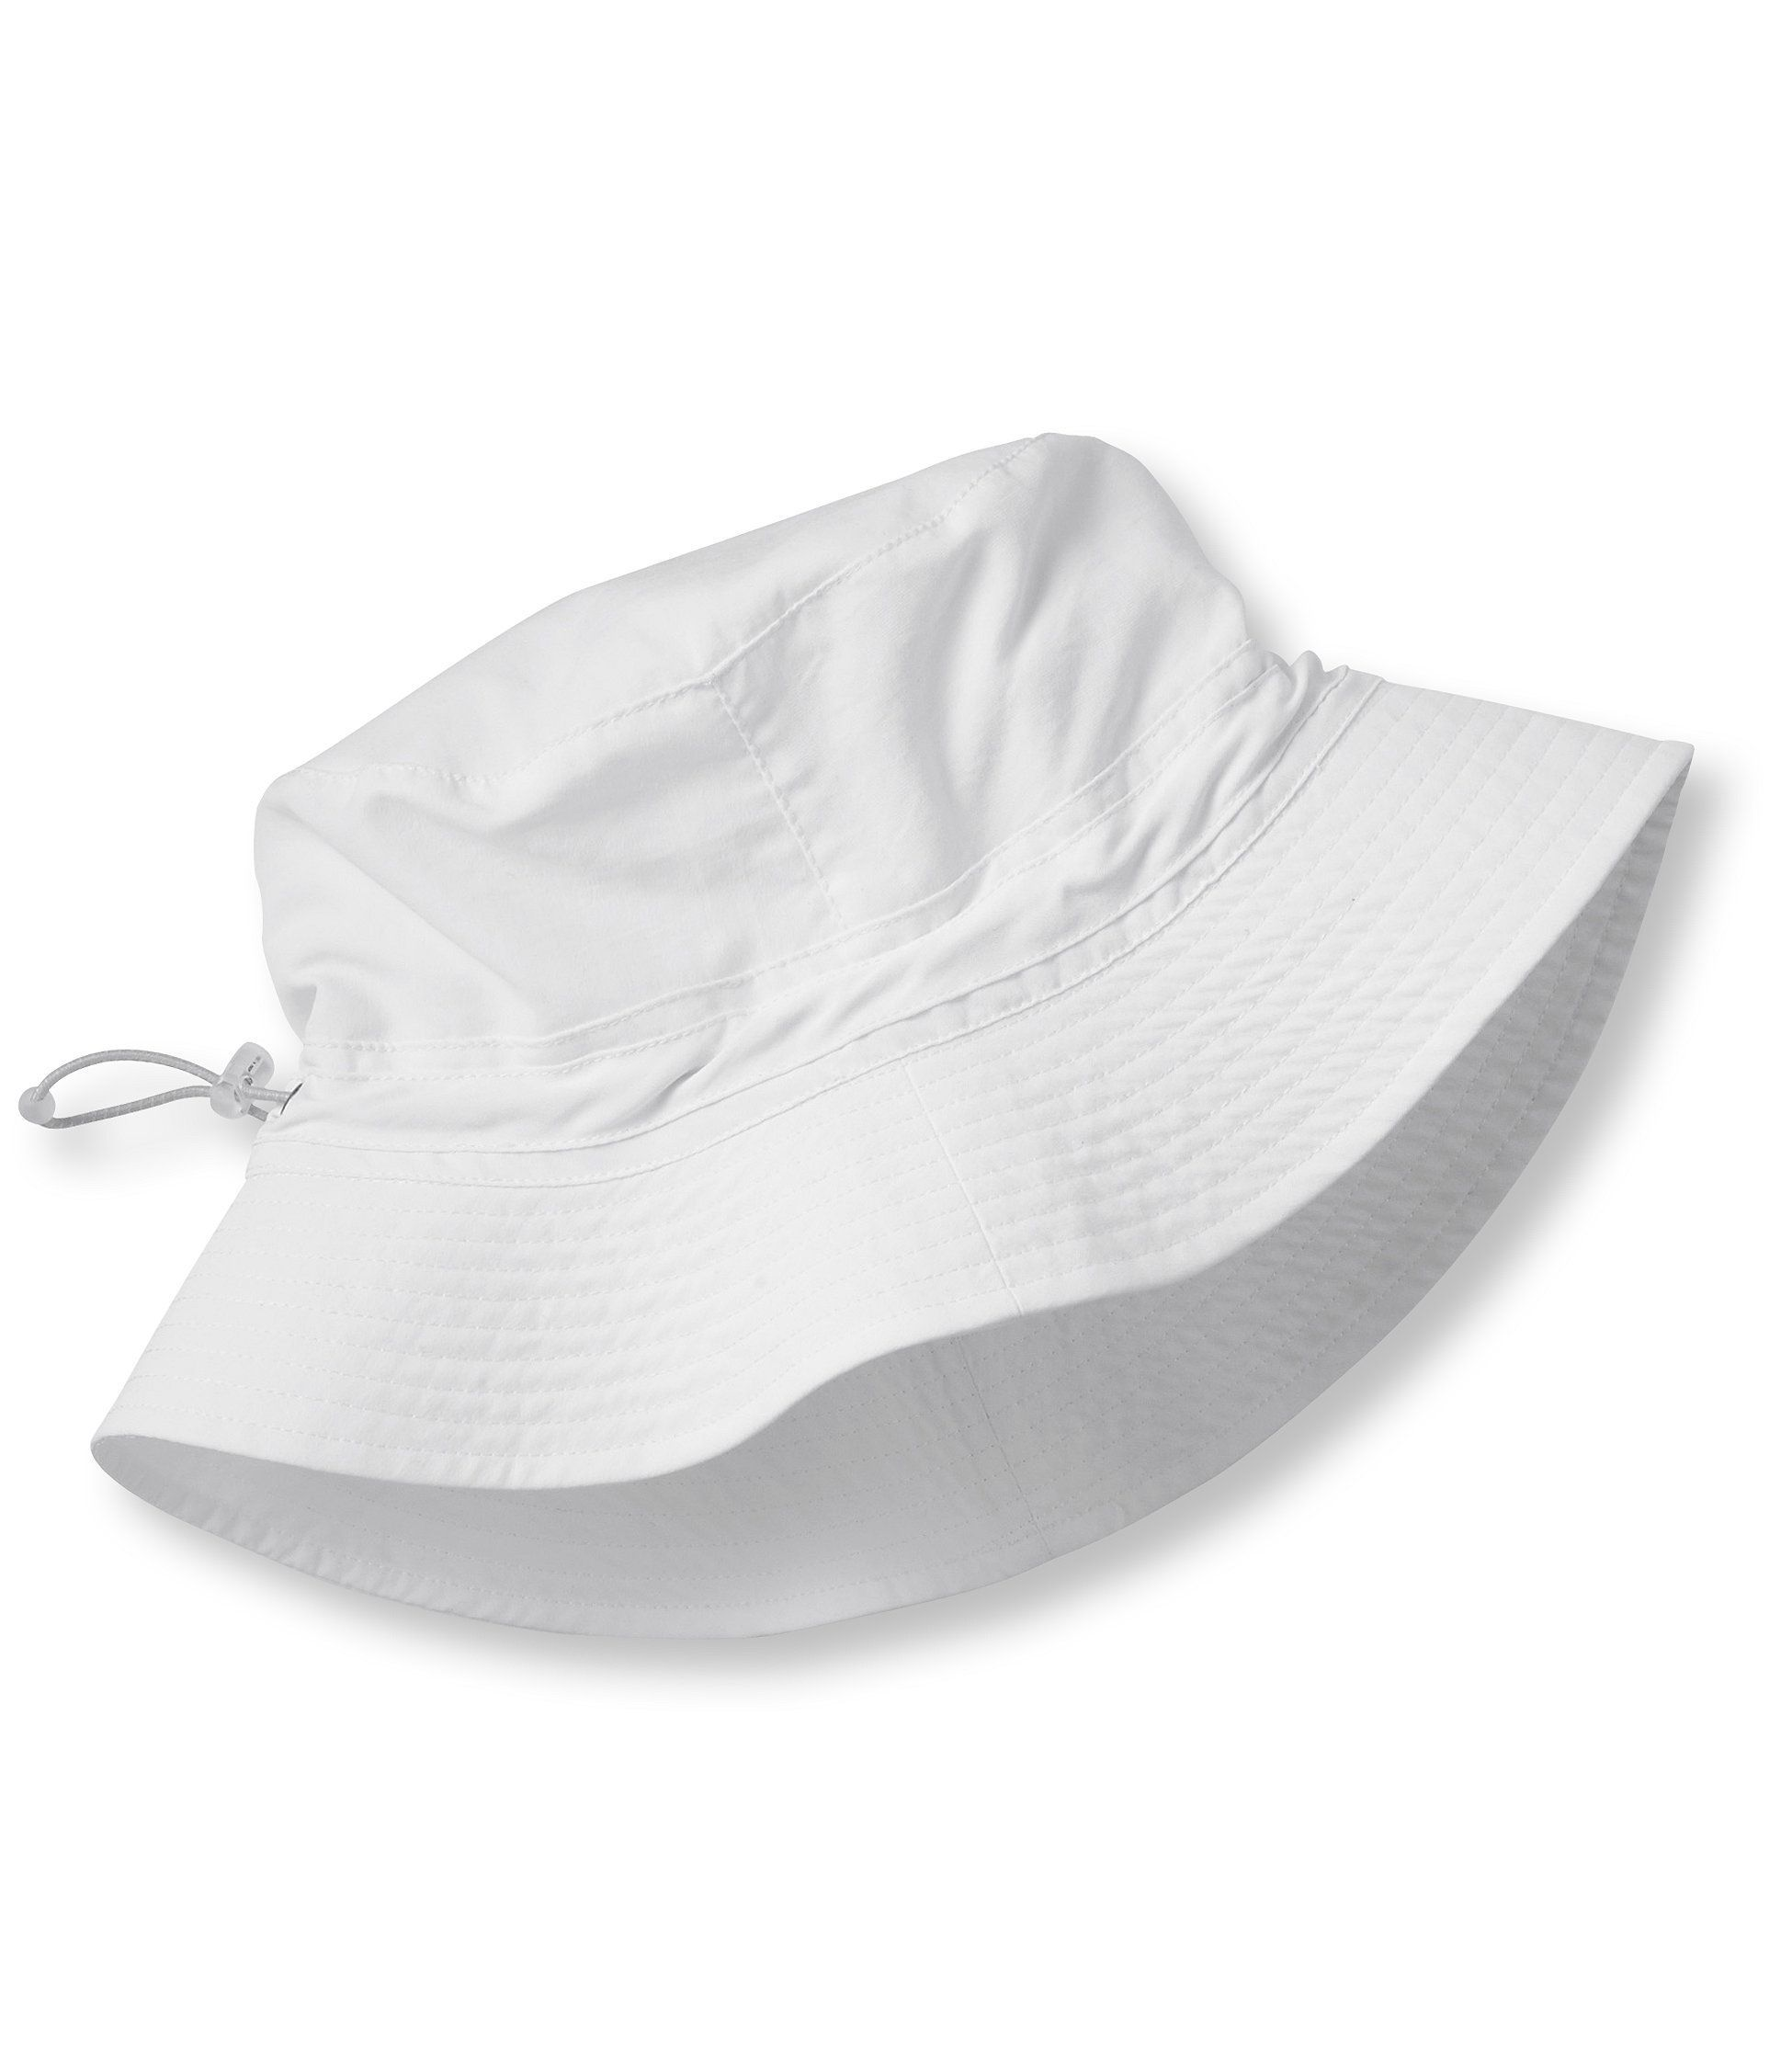 Beansport Packable Upf Sun Hat  88401db88a1c